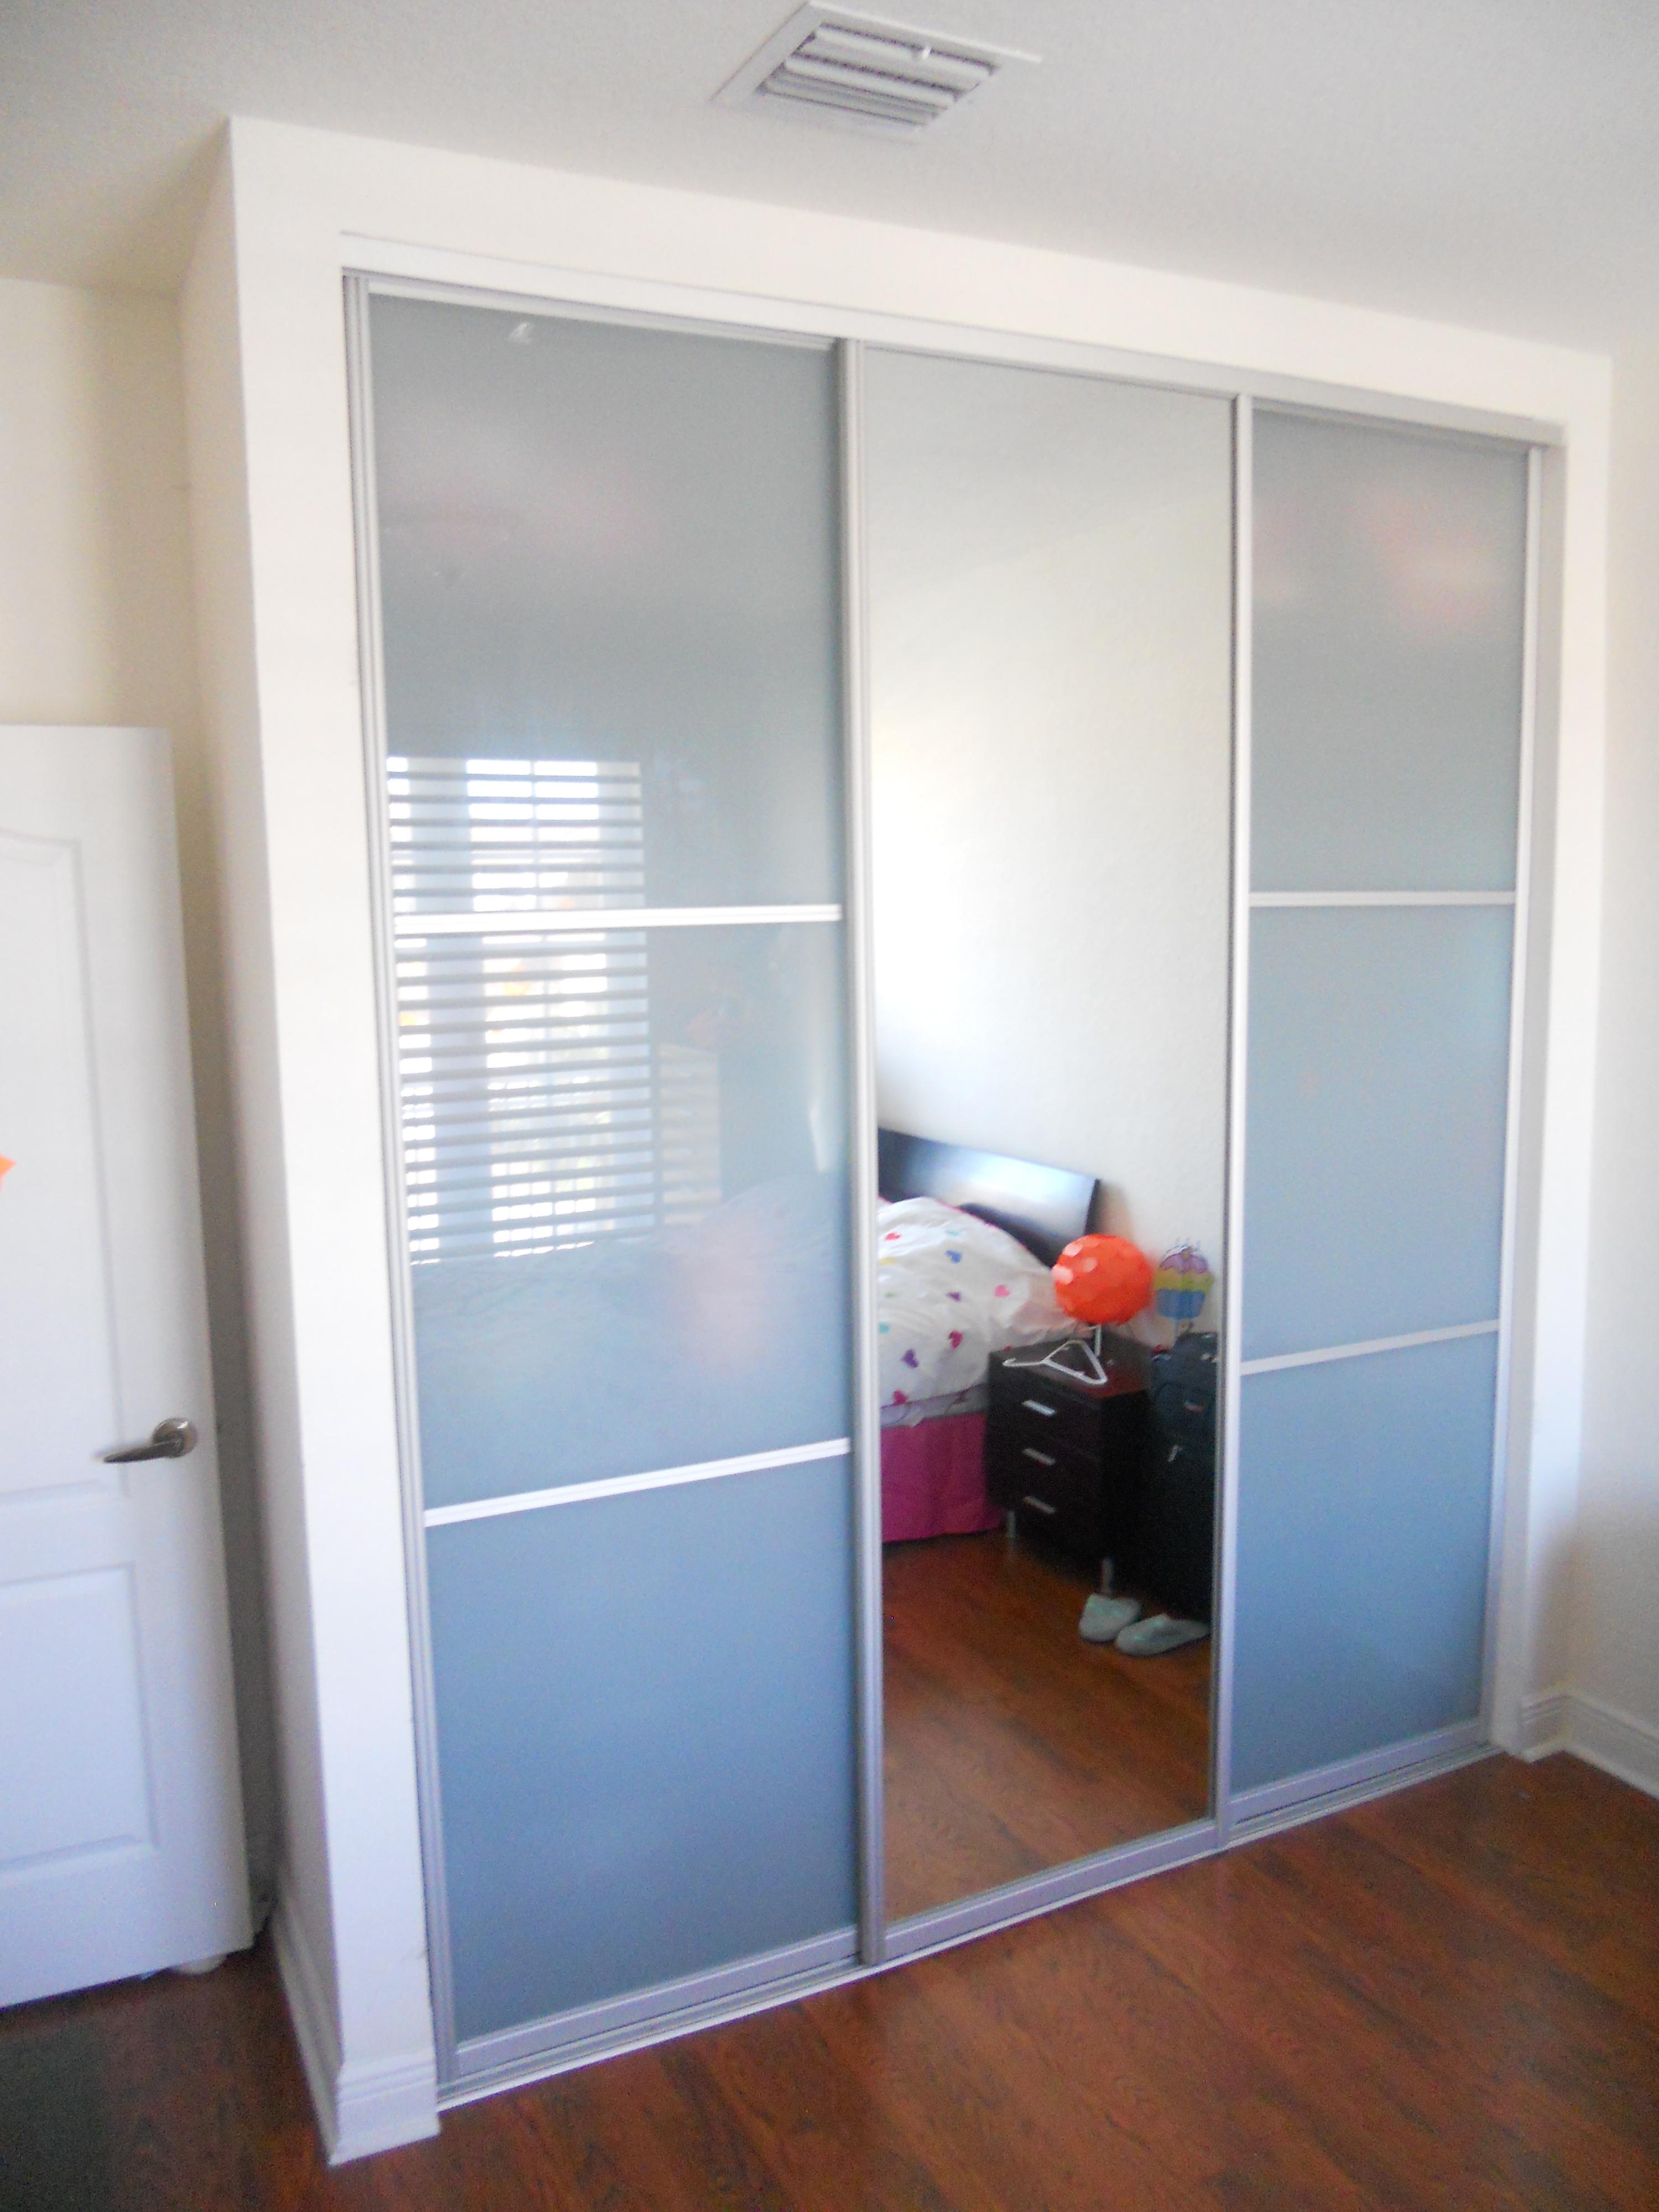 96 Sliding Closet Door Track3000 X 4000